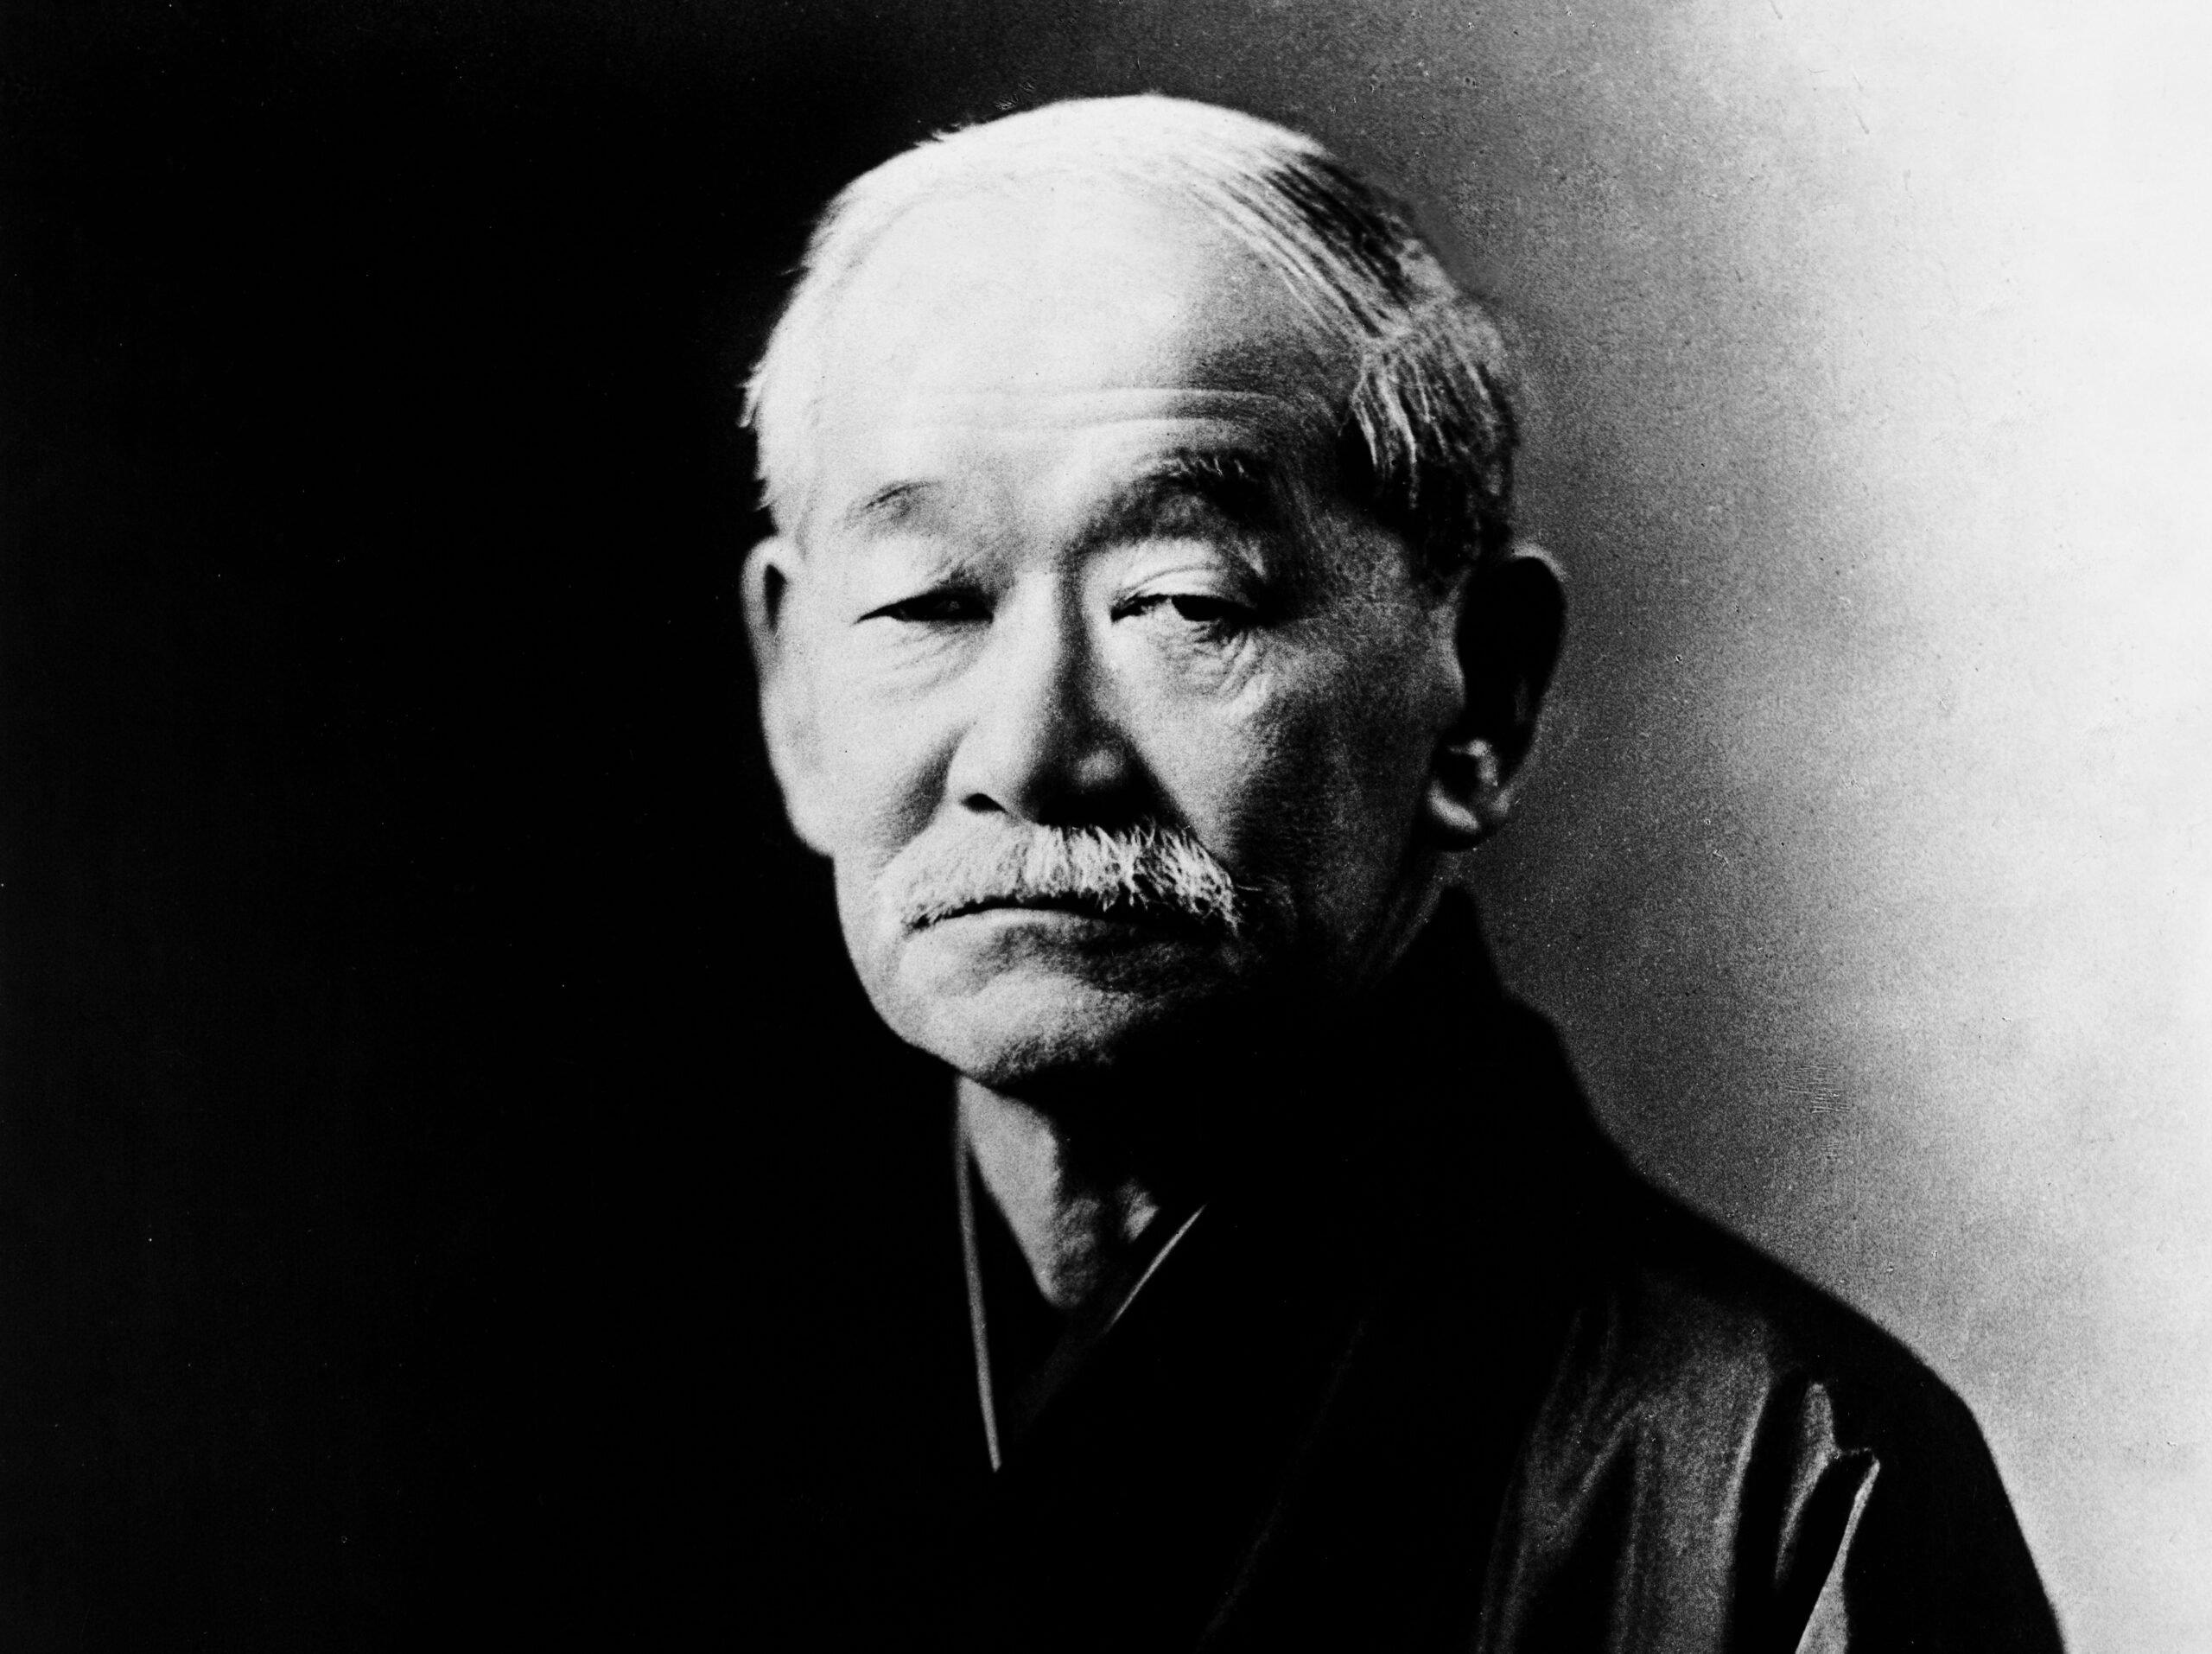 THE MONTH OF JIGORO KANO